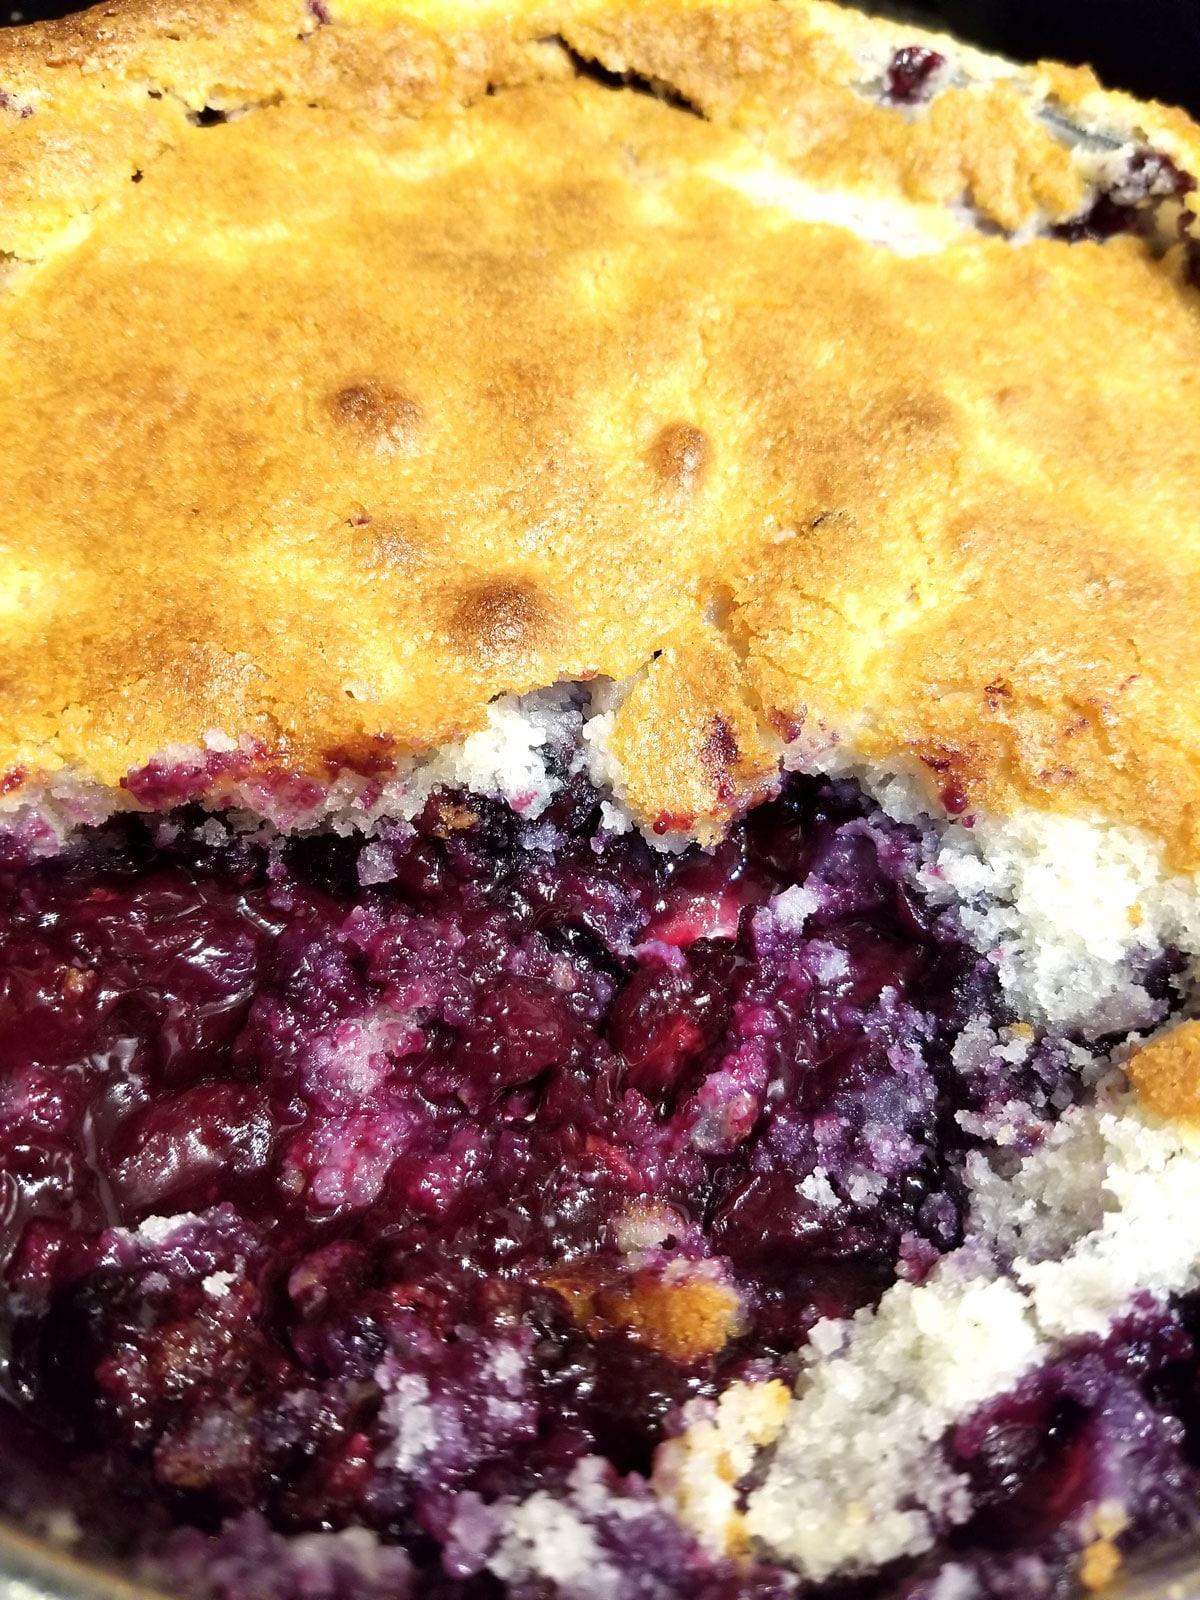 blueberry cobbler from scratch